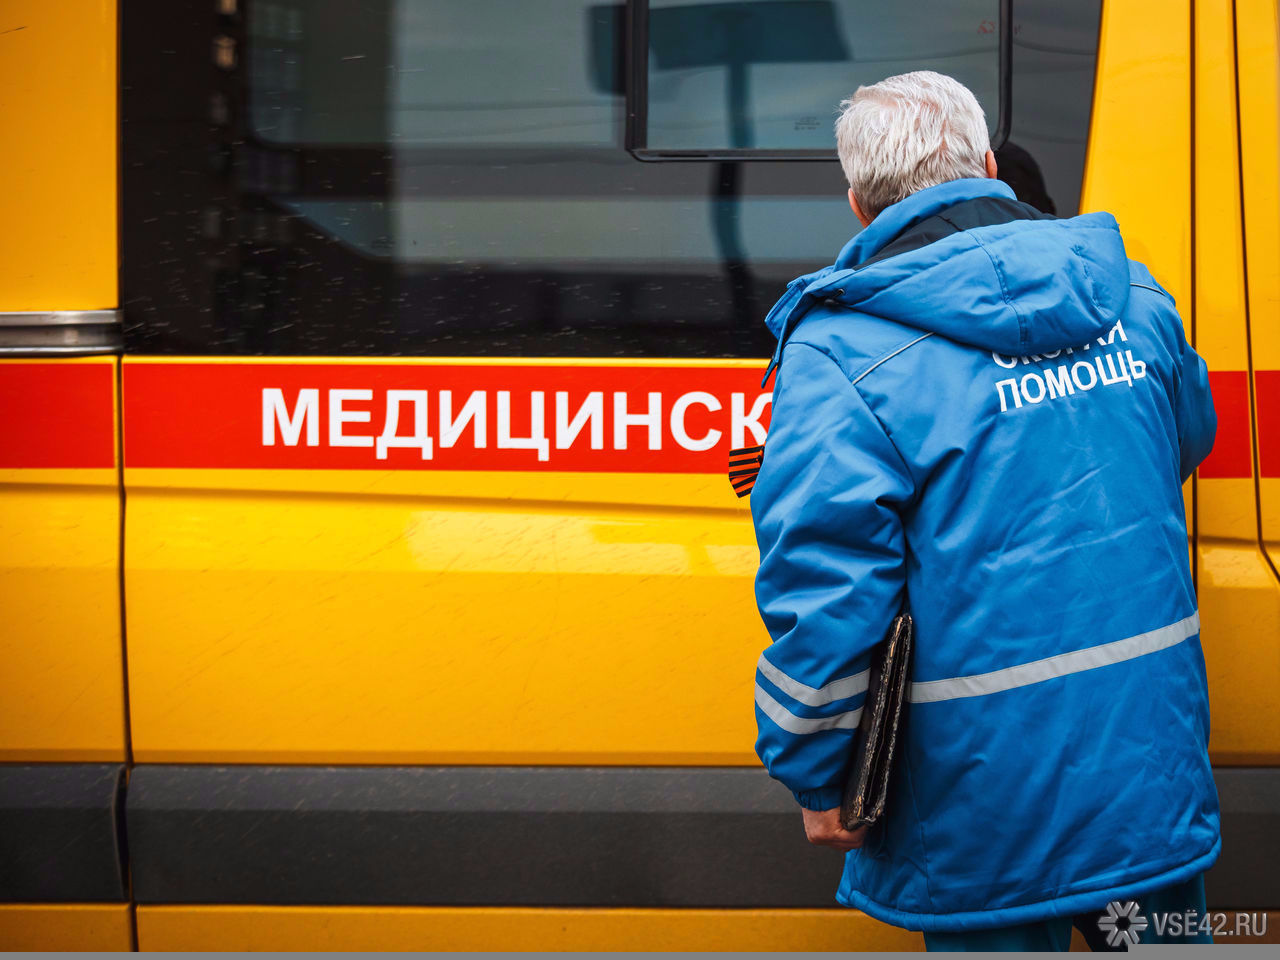 ВДТП натрассе Новосибирск-Иркутск погибли мужчина идевочка